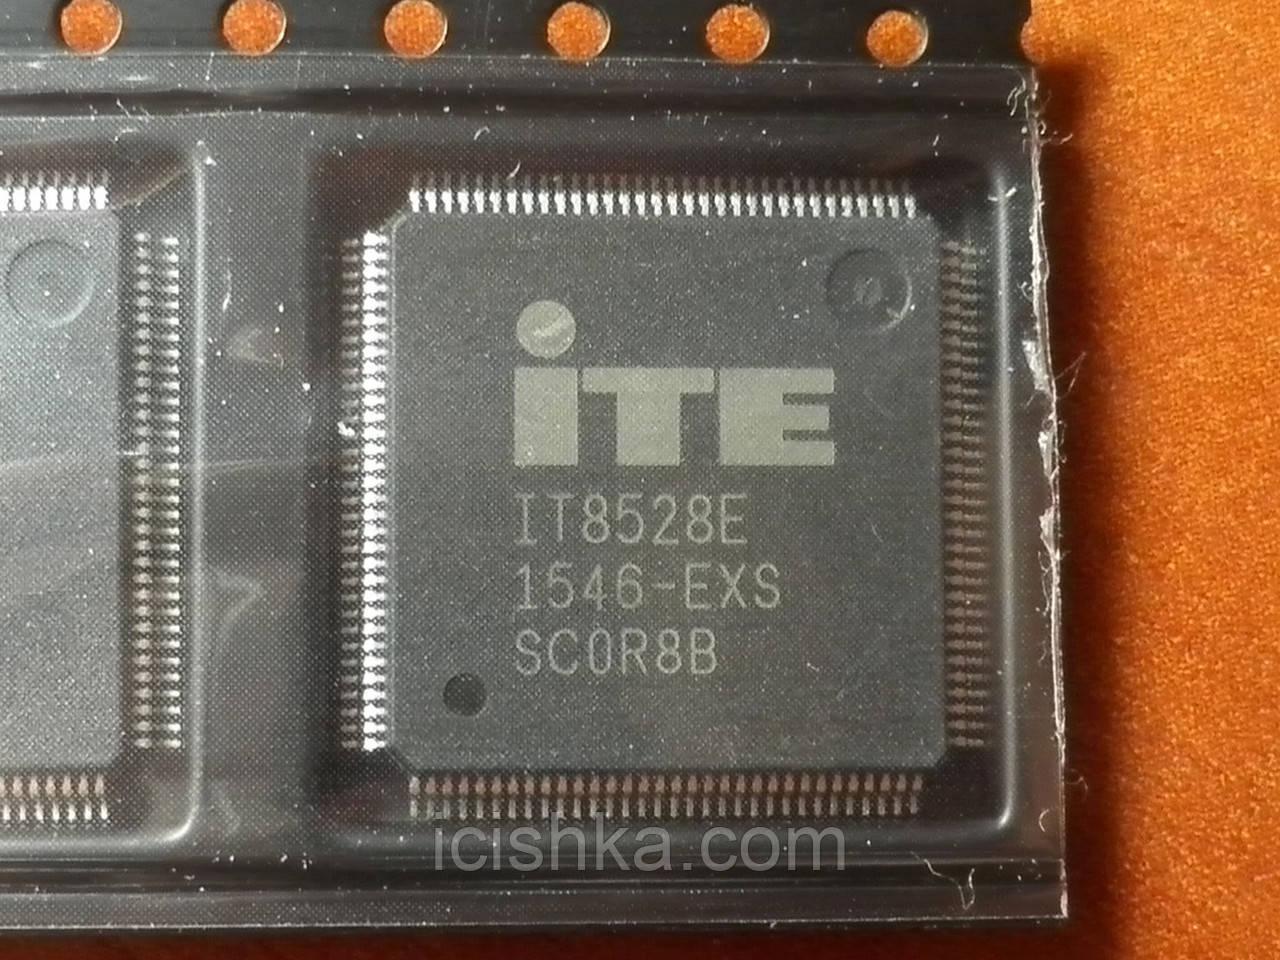 ITE IT8528E EXS - Мультиконтроллер